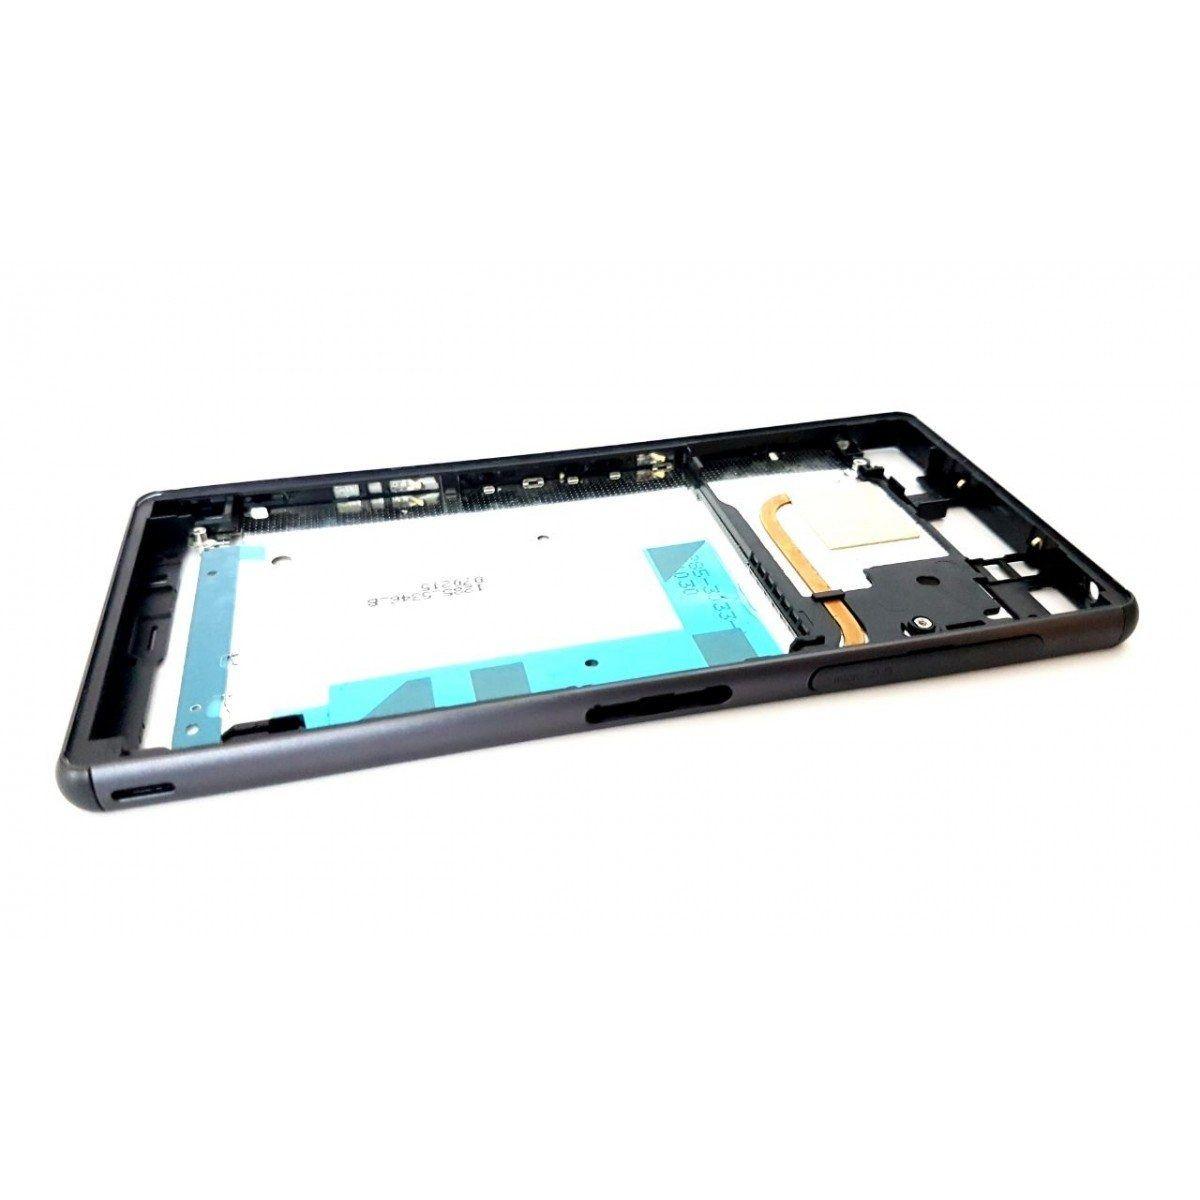 Aro Celular Sony Xperia Z3 D6663 D6643 D6653 2 Chips Preto